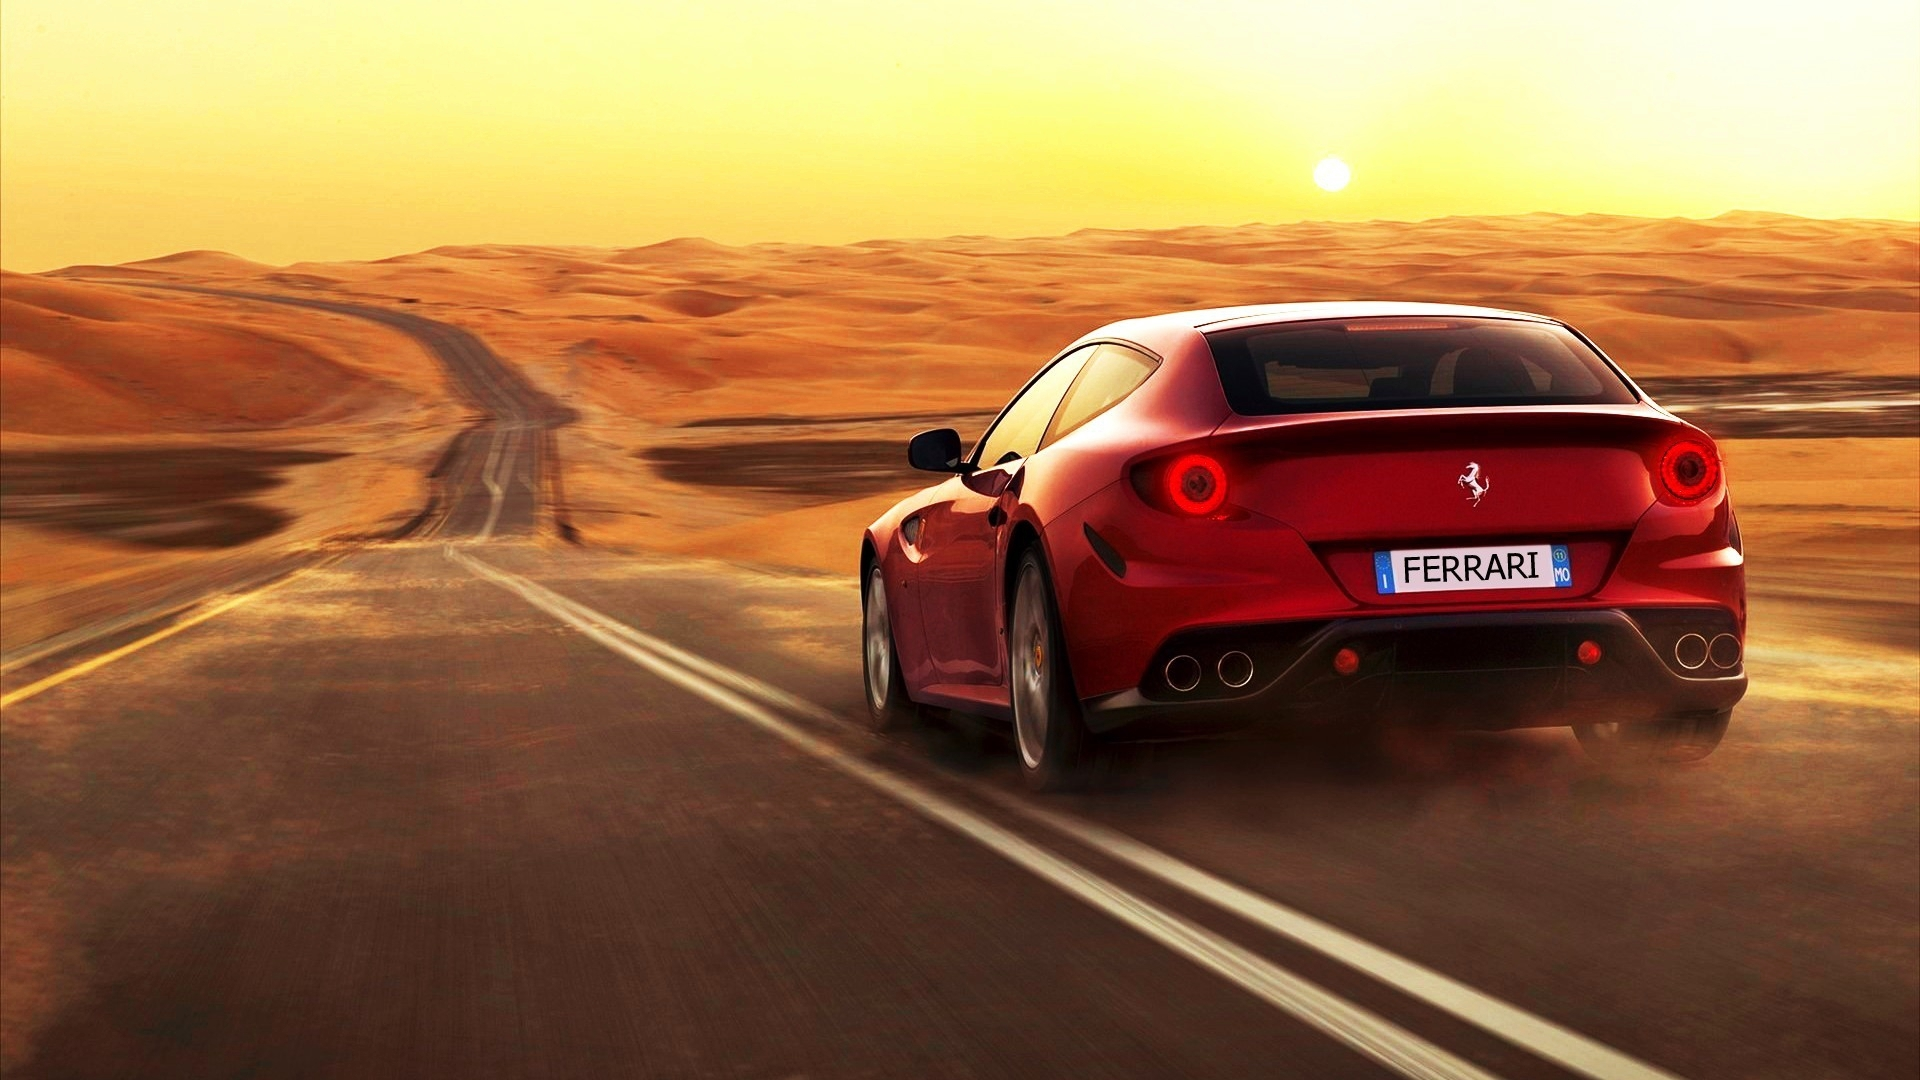 amazing-ferrari-Widescreen-Of-Ferrari-Wp-Dym-Shshi-pertaining-to-amazin-wallpaper-wp3402299